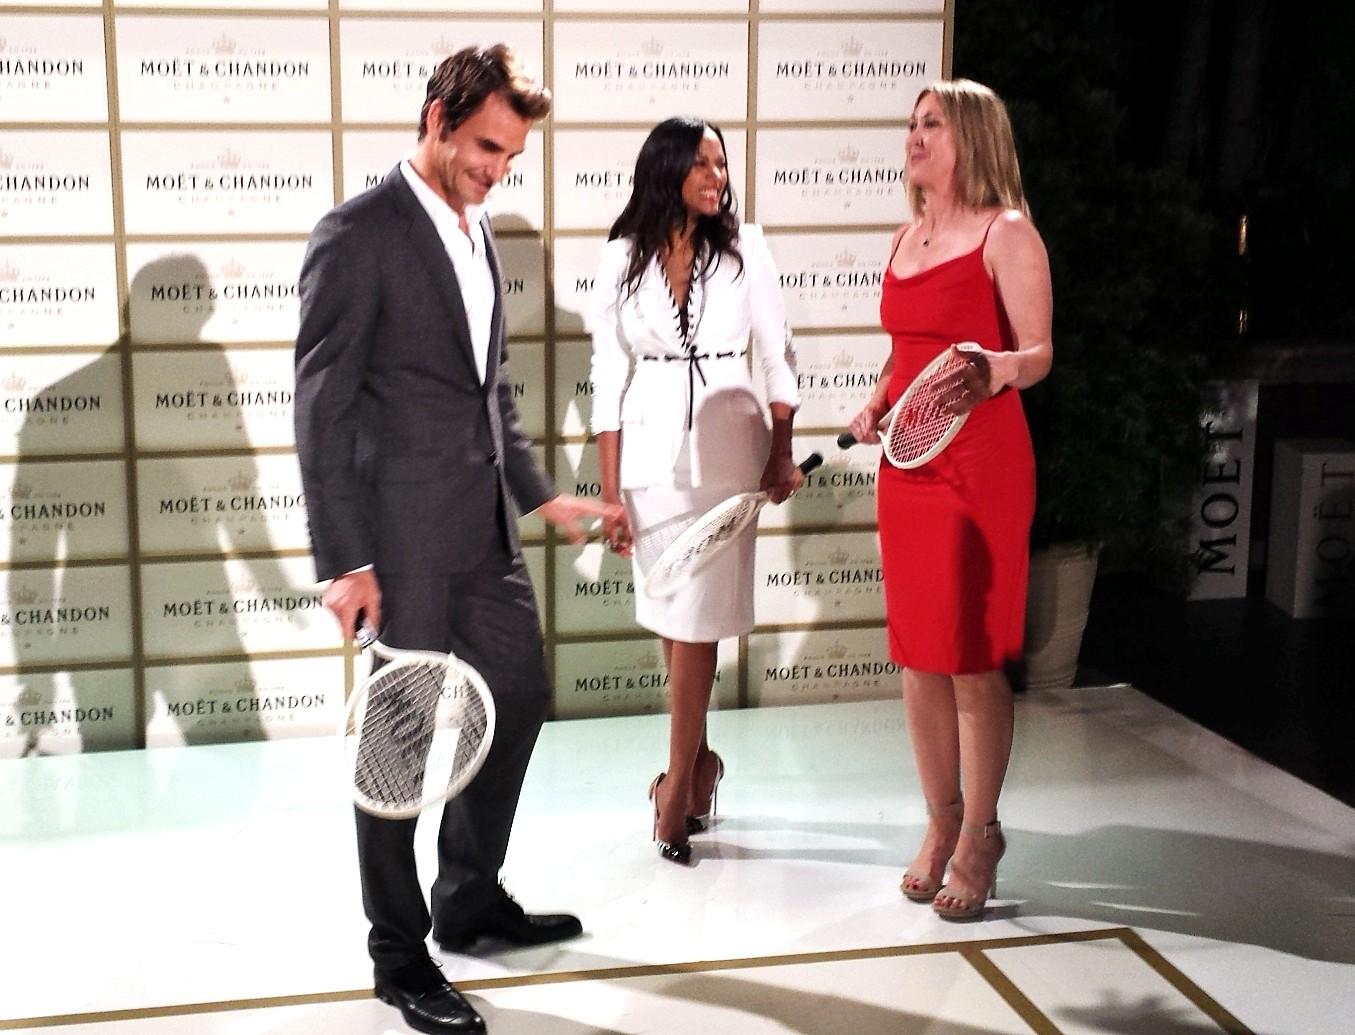 Moet Chandon, Roger Federer, Zoe Saldana, Jill Montgomery